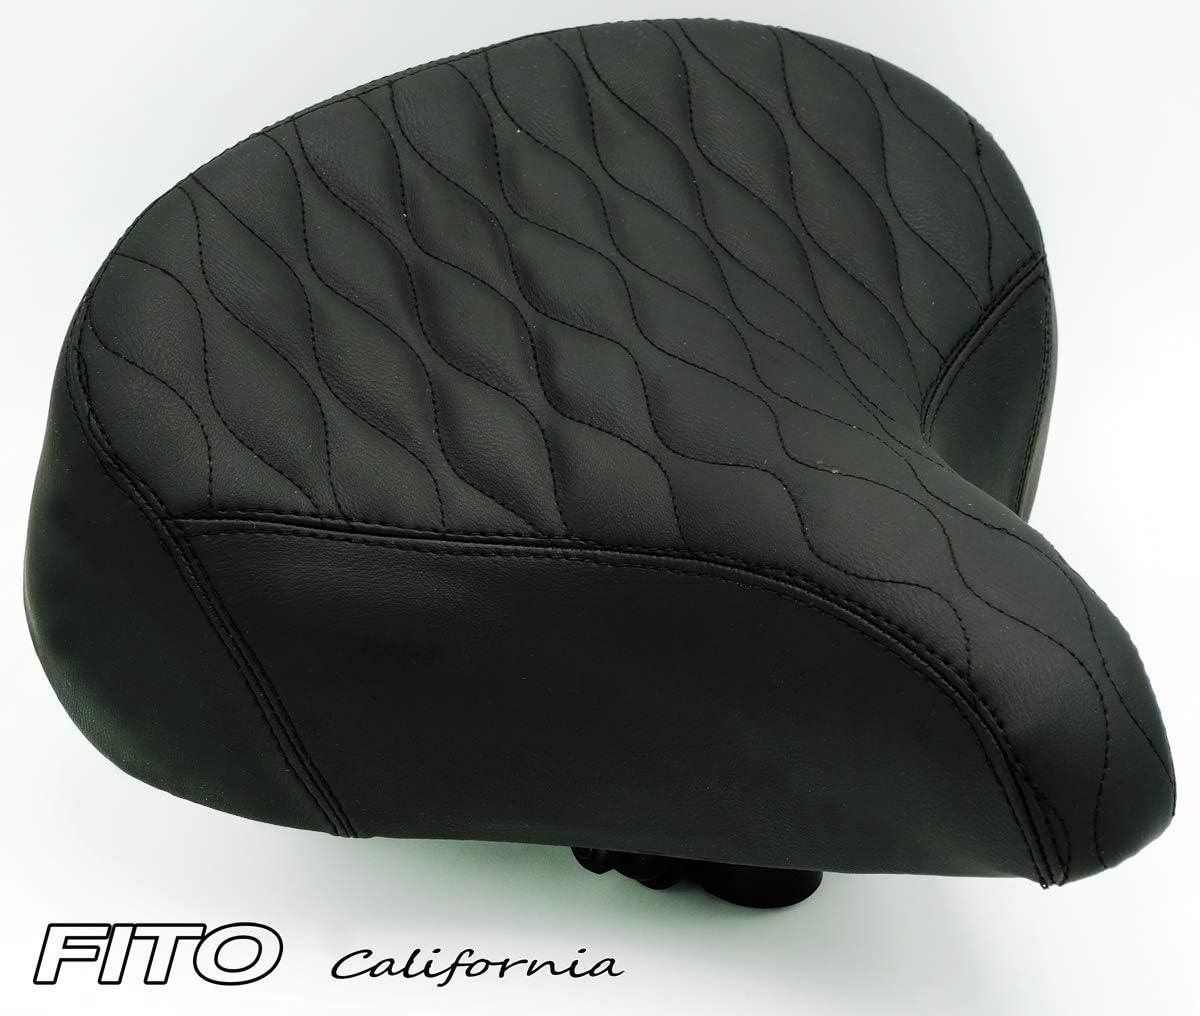 Fito Oversize 10.5 x 9.5 Synthetic Leather Retro Beach Cruiser Bike Seat Saddle